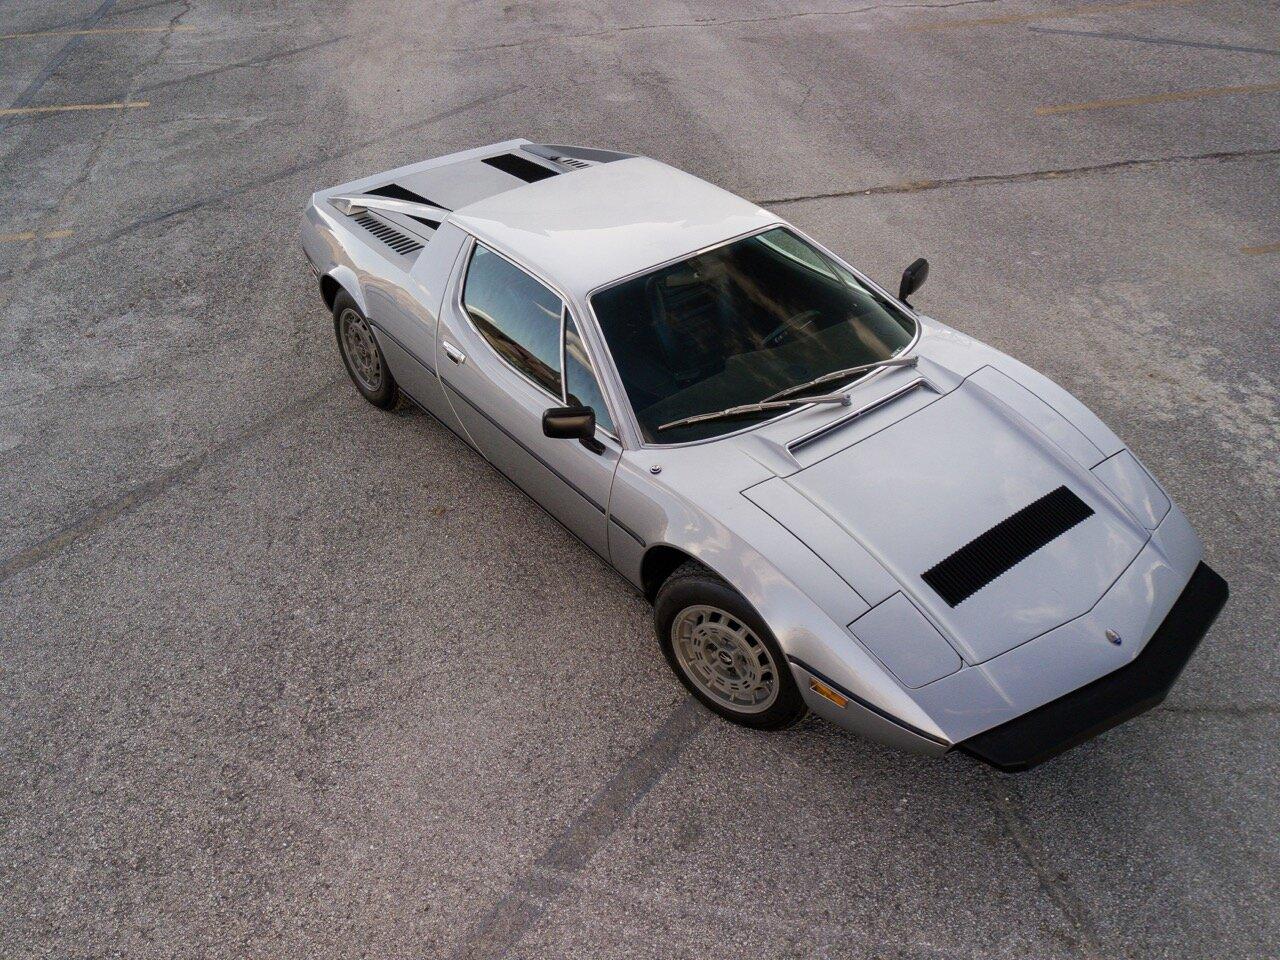 1977 Maserati Merak SS (AM122US2210) - 03.jpg